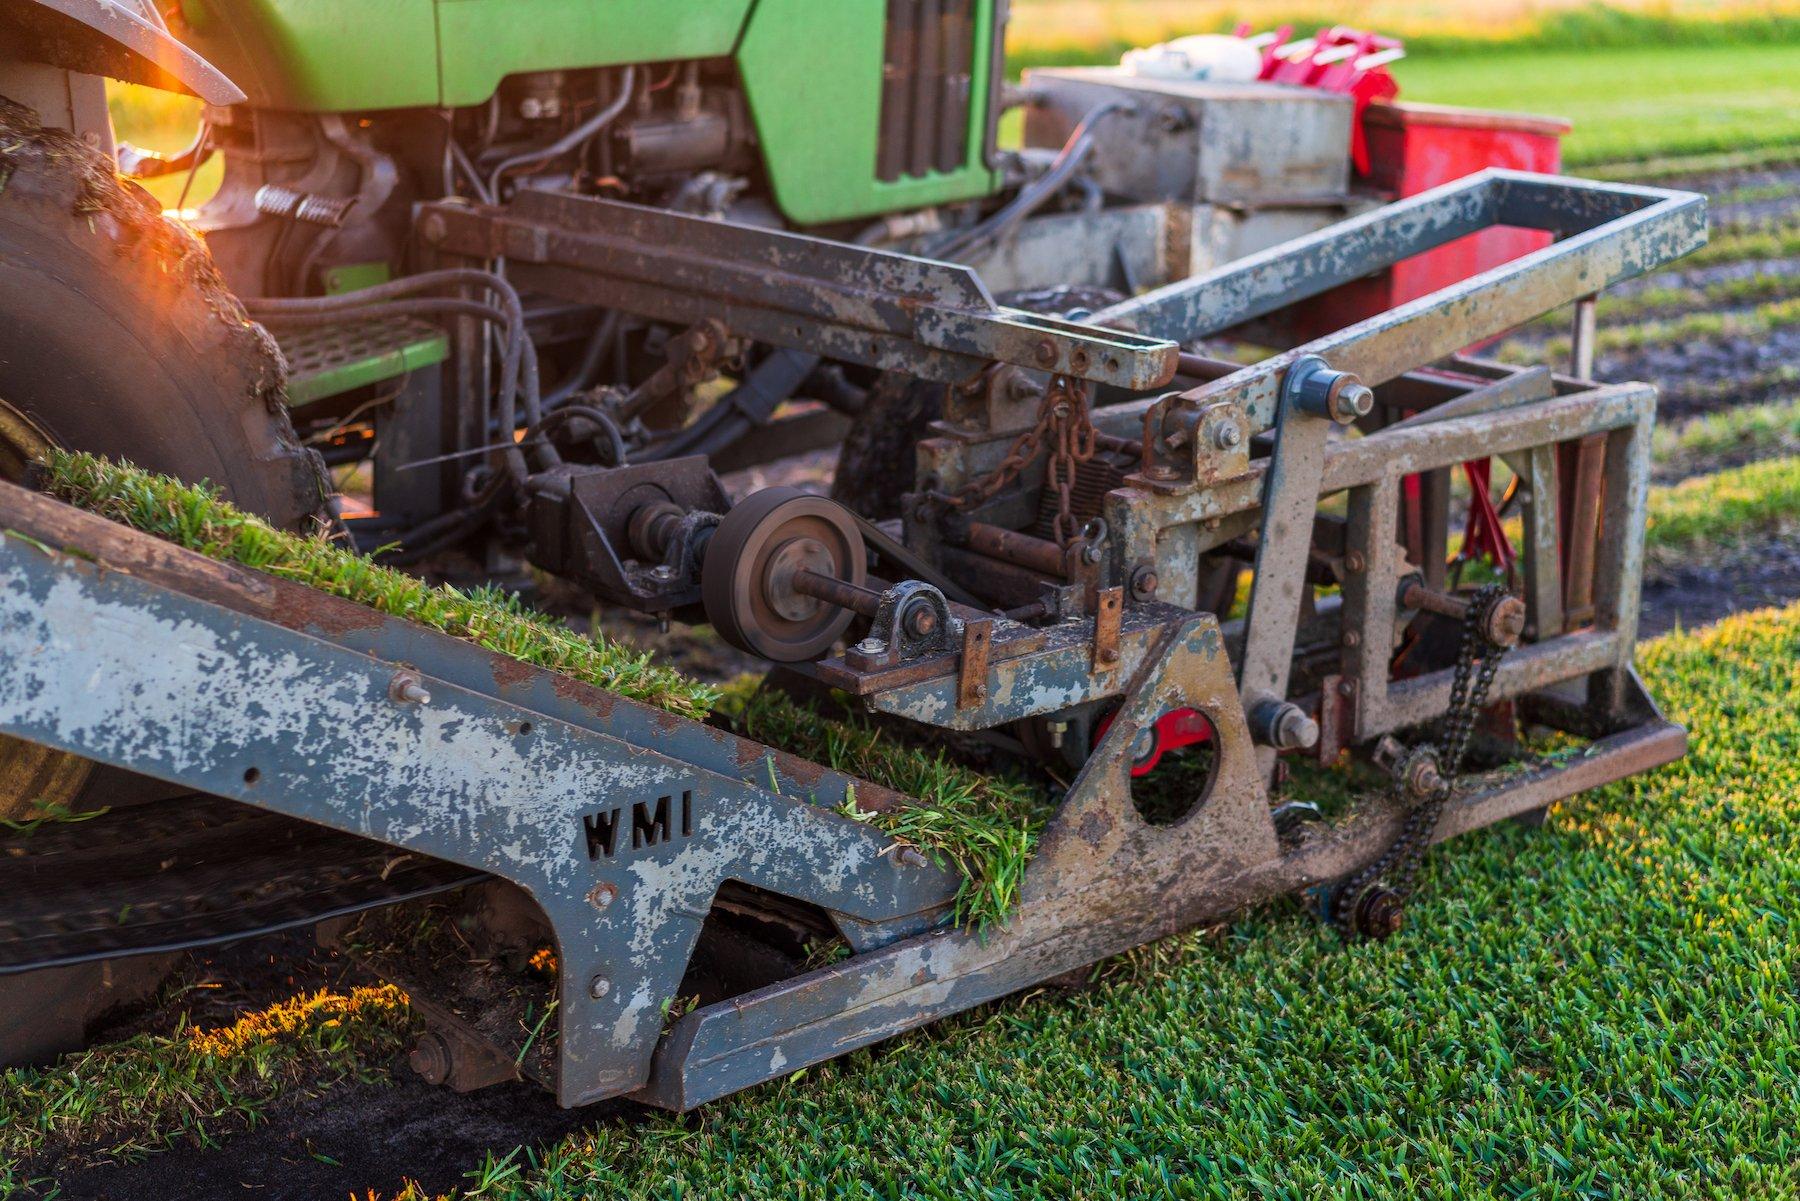 Up close of a sod harvesting machine